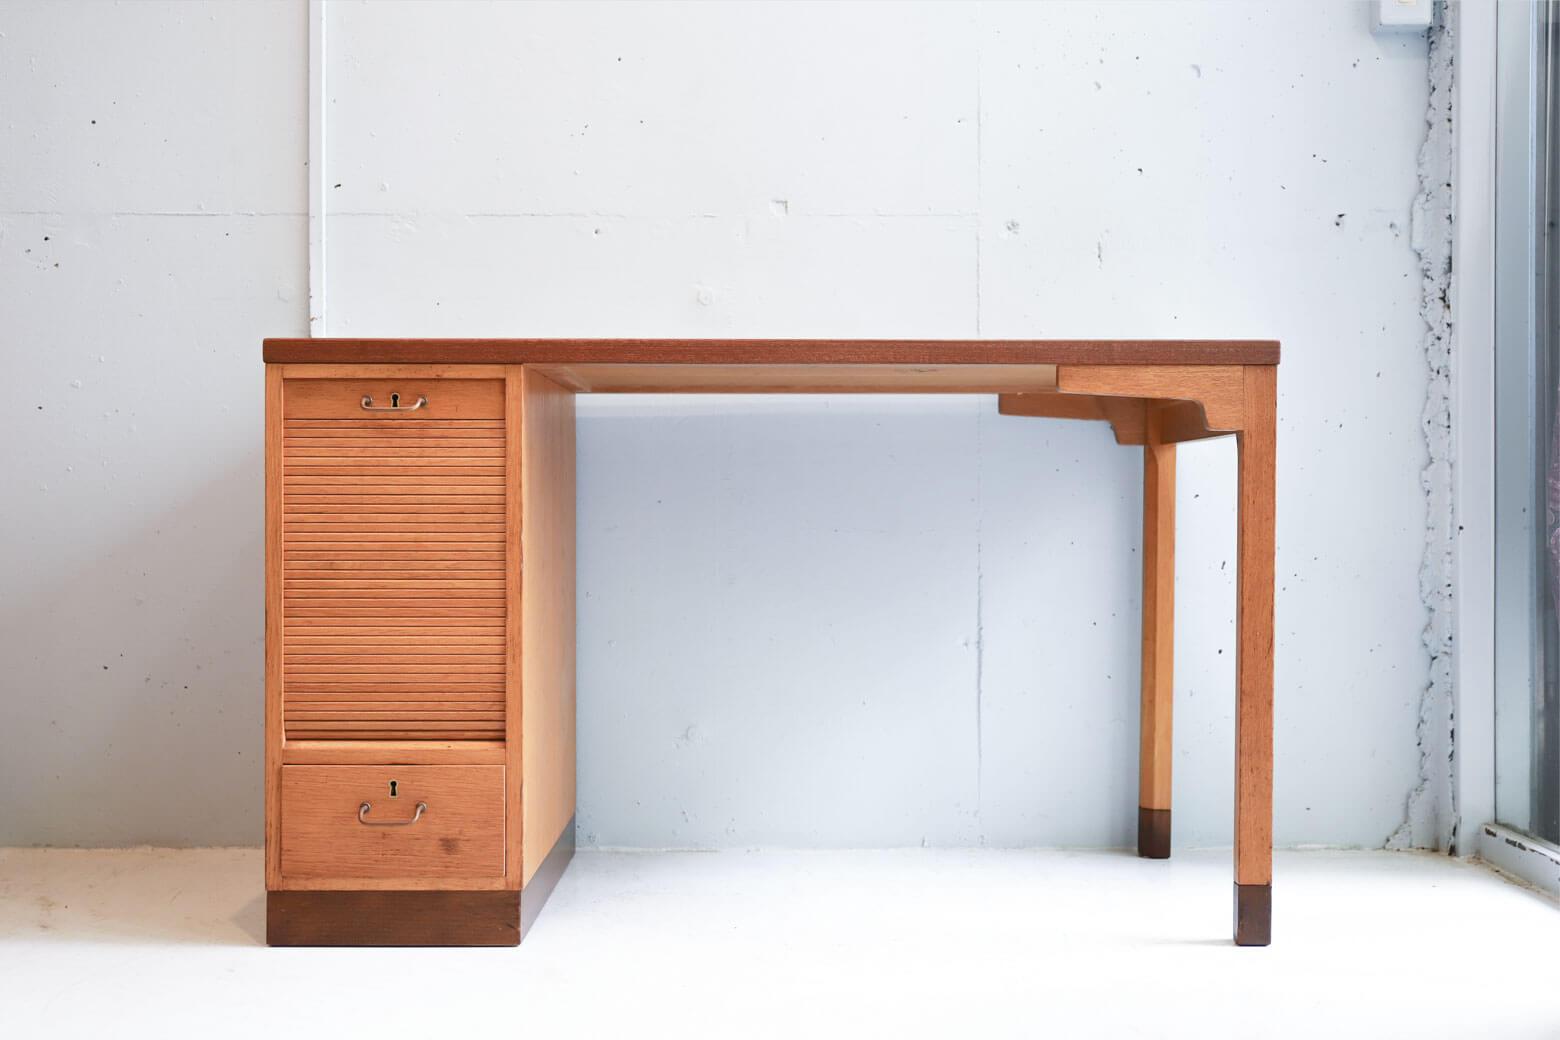 Erik Jørgensen Ejner Larsen design Desk/エリック・ヨーゲンセン アイナー ラーセン デザイン デスク